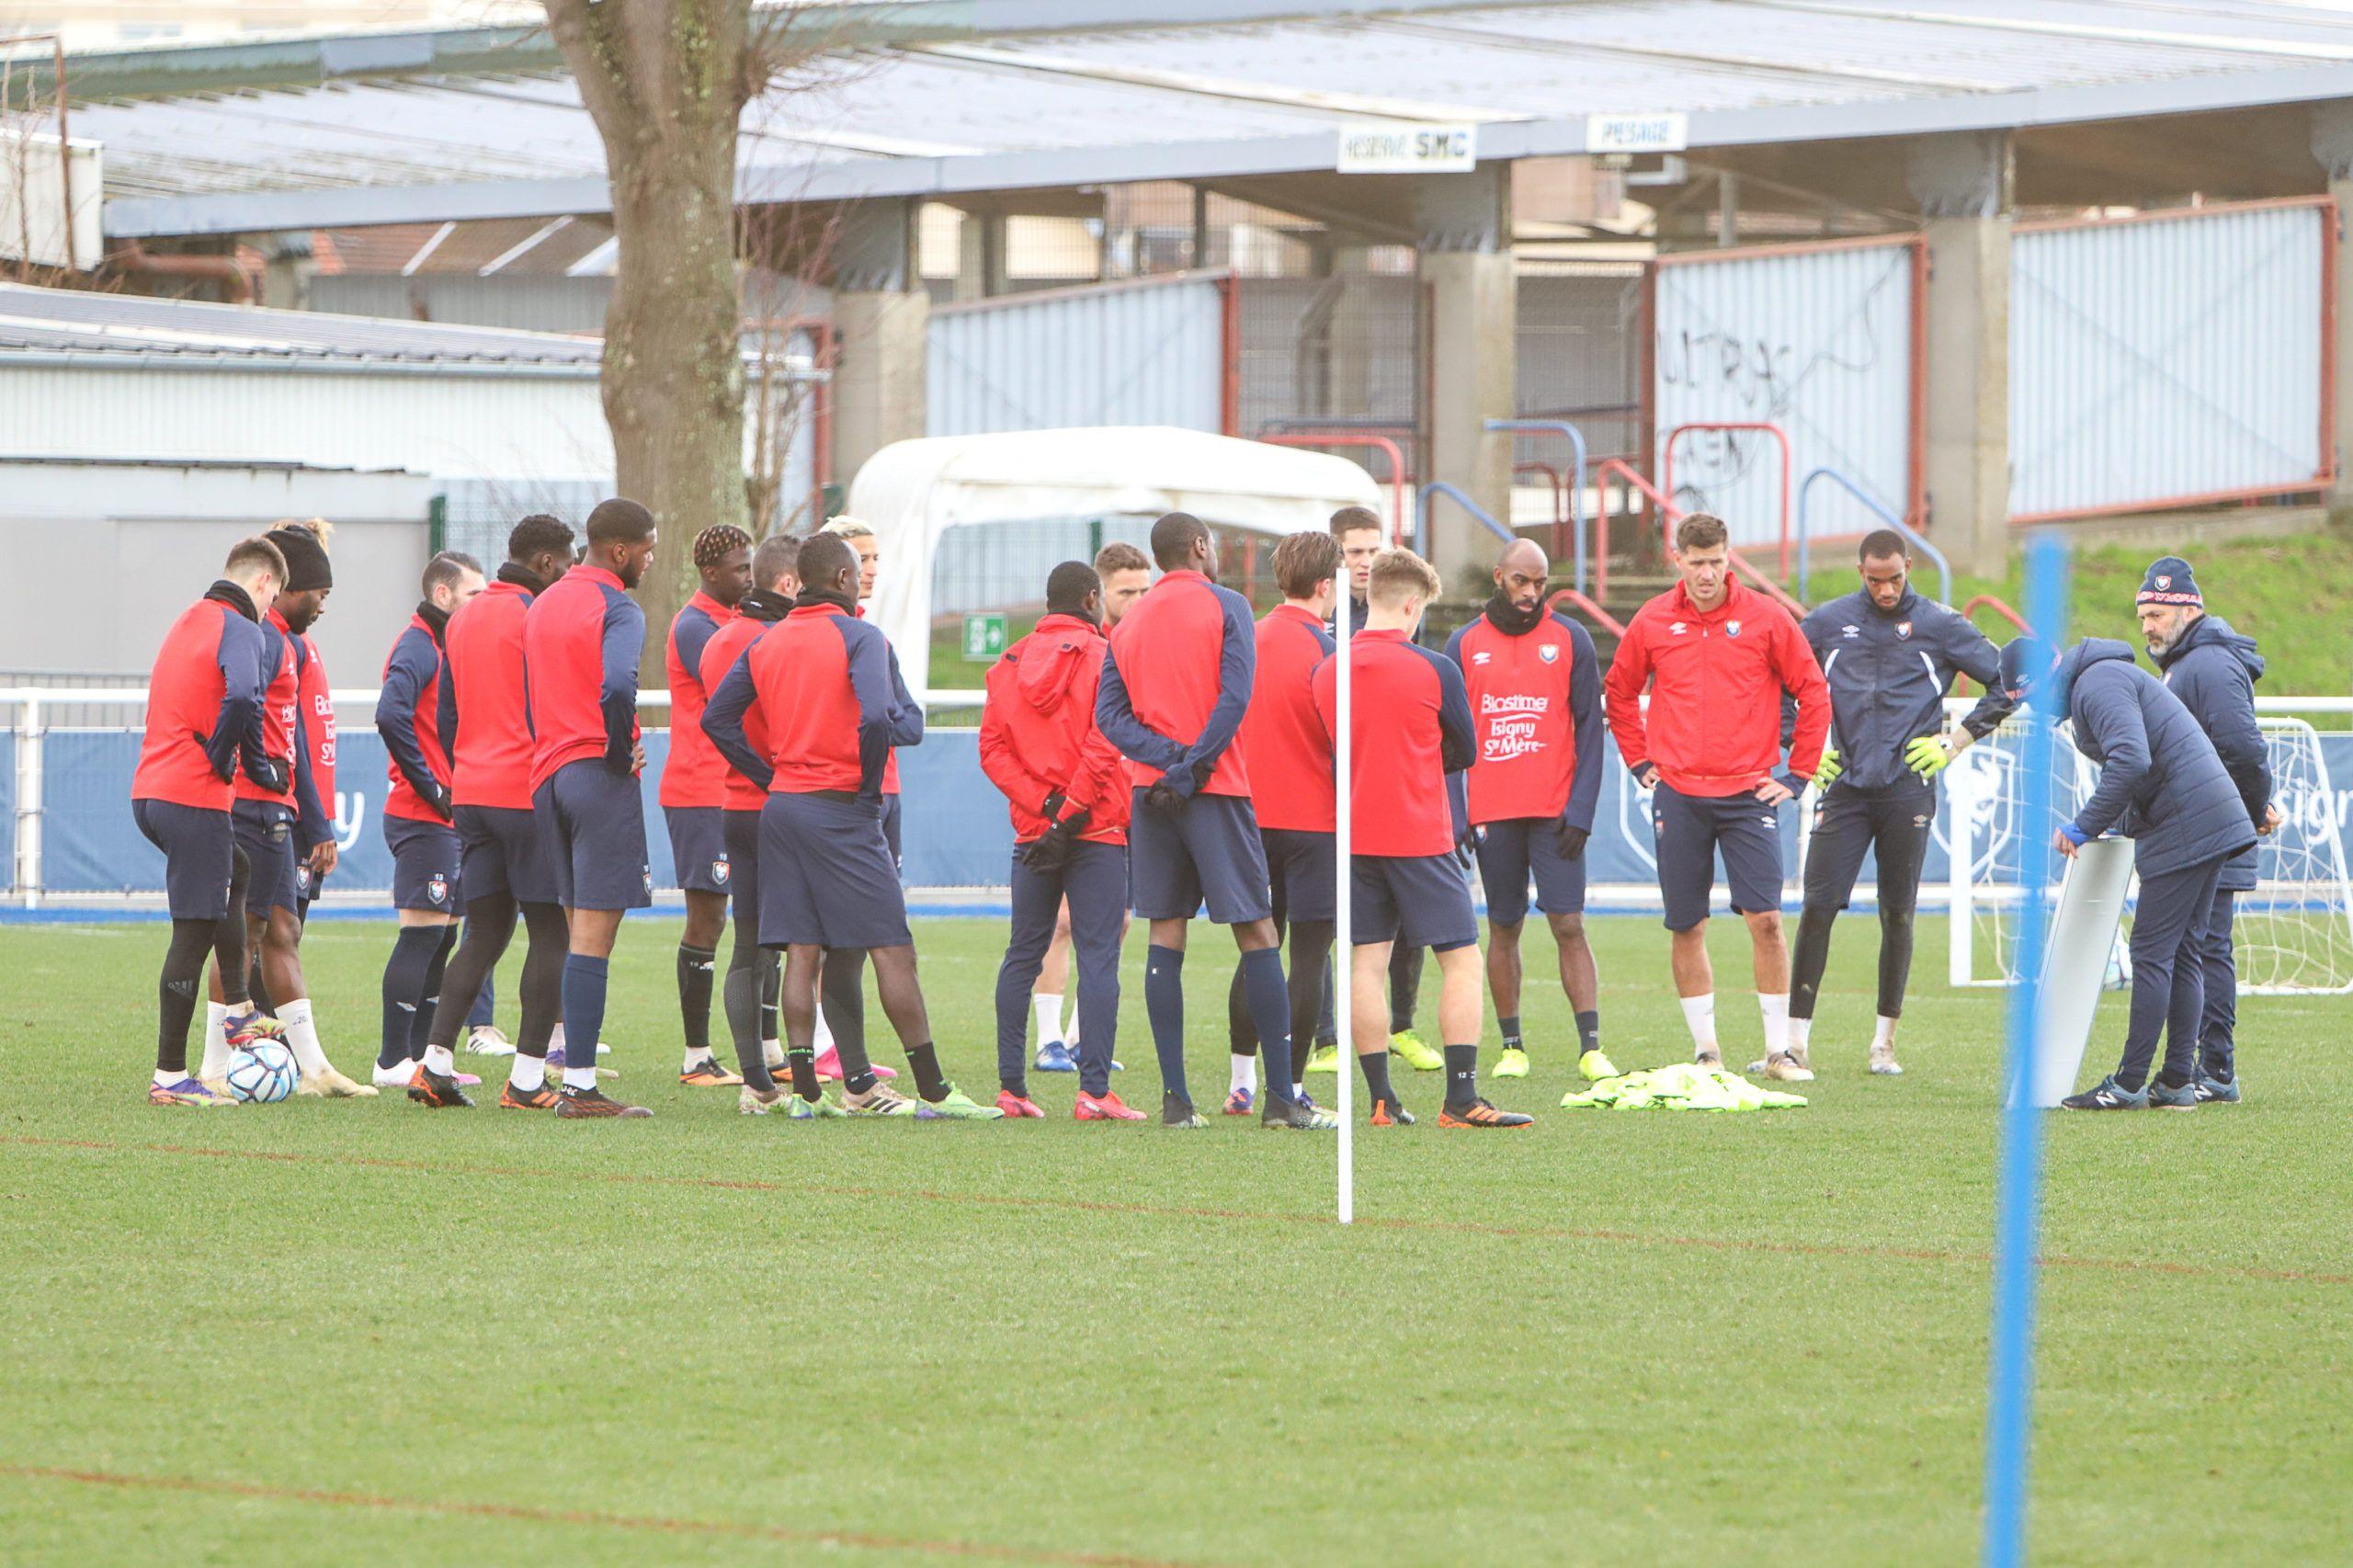 Armougom, Nsona et Jeannot forfaits contre Amiens ce vendredi